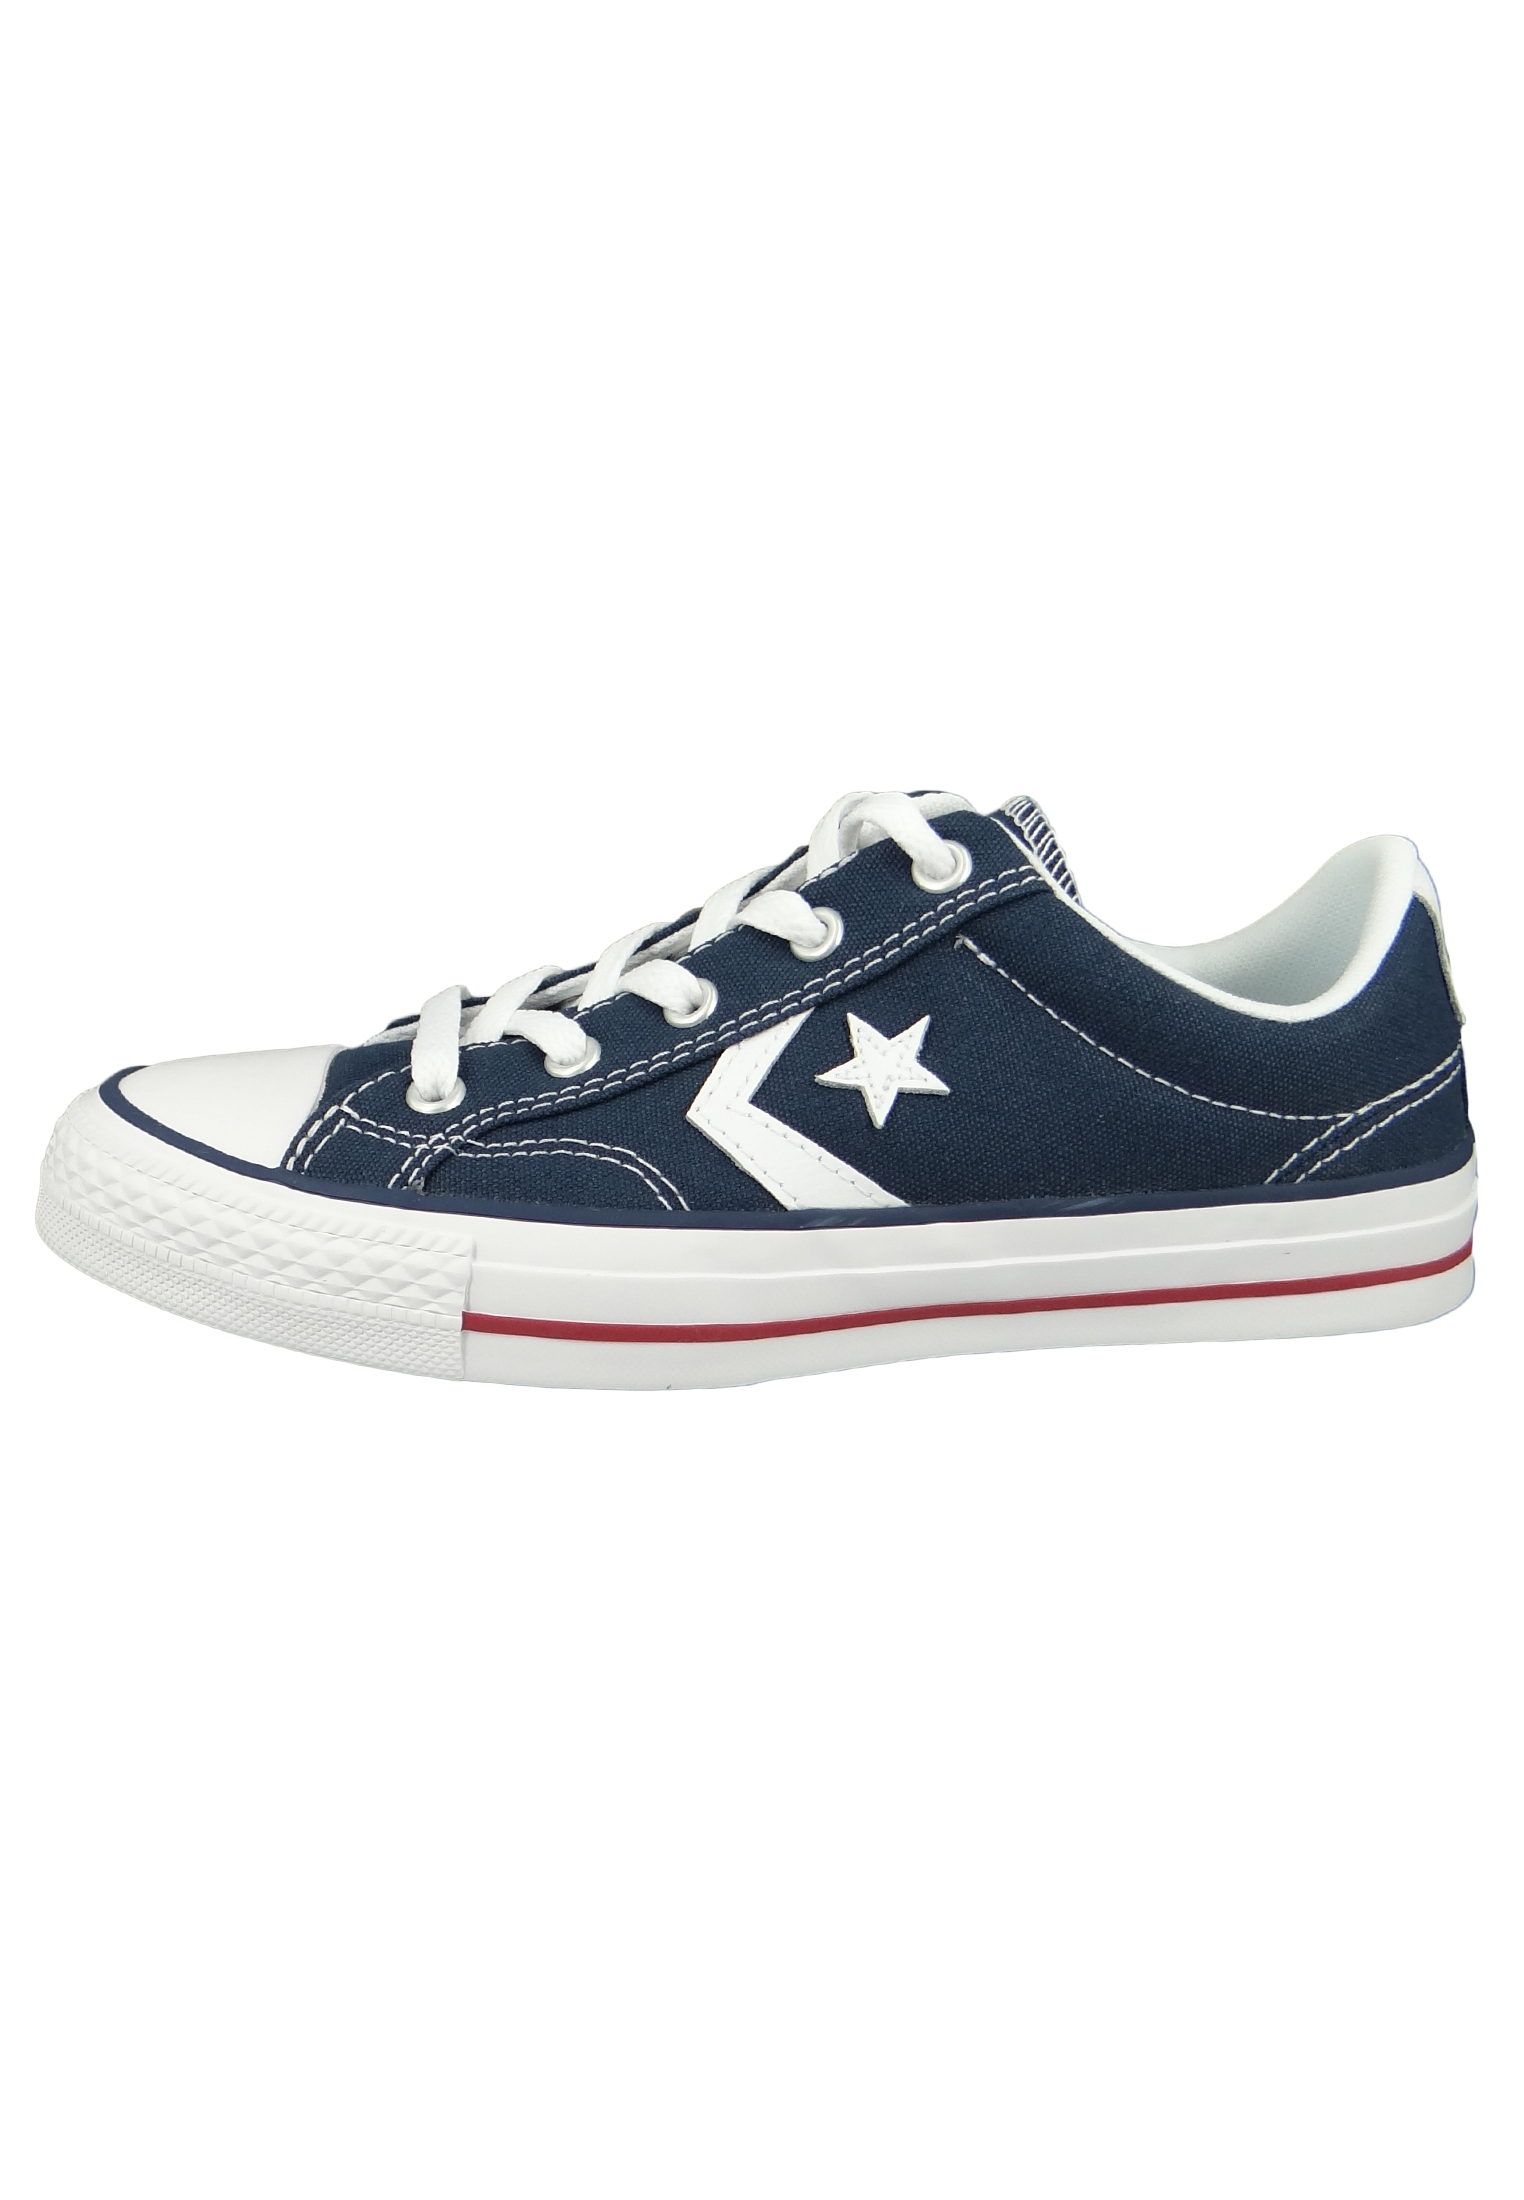 Converse Chucks 144150C Blau Star Player OX Navy White